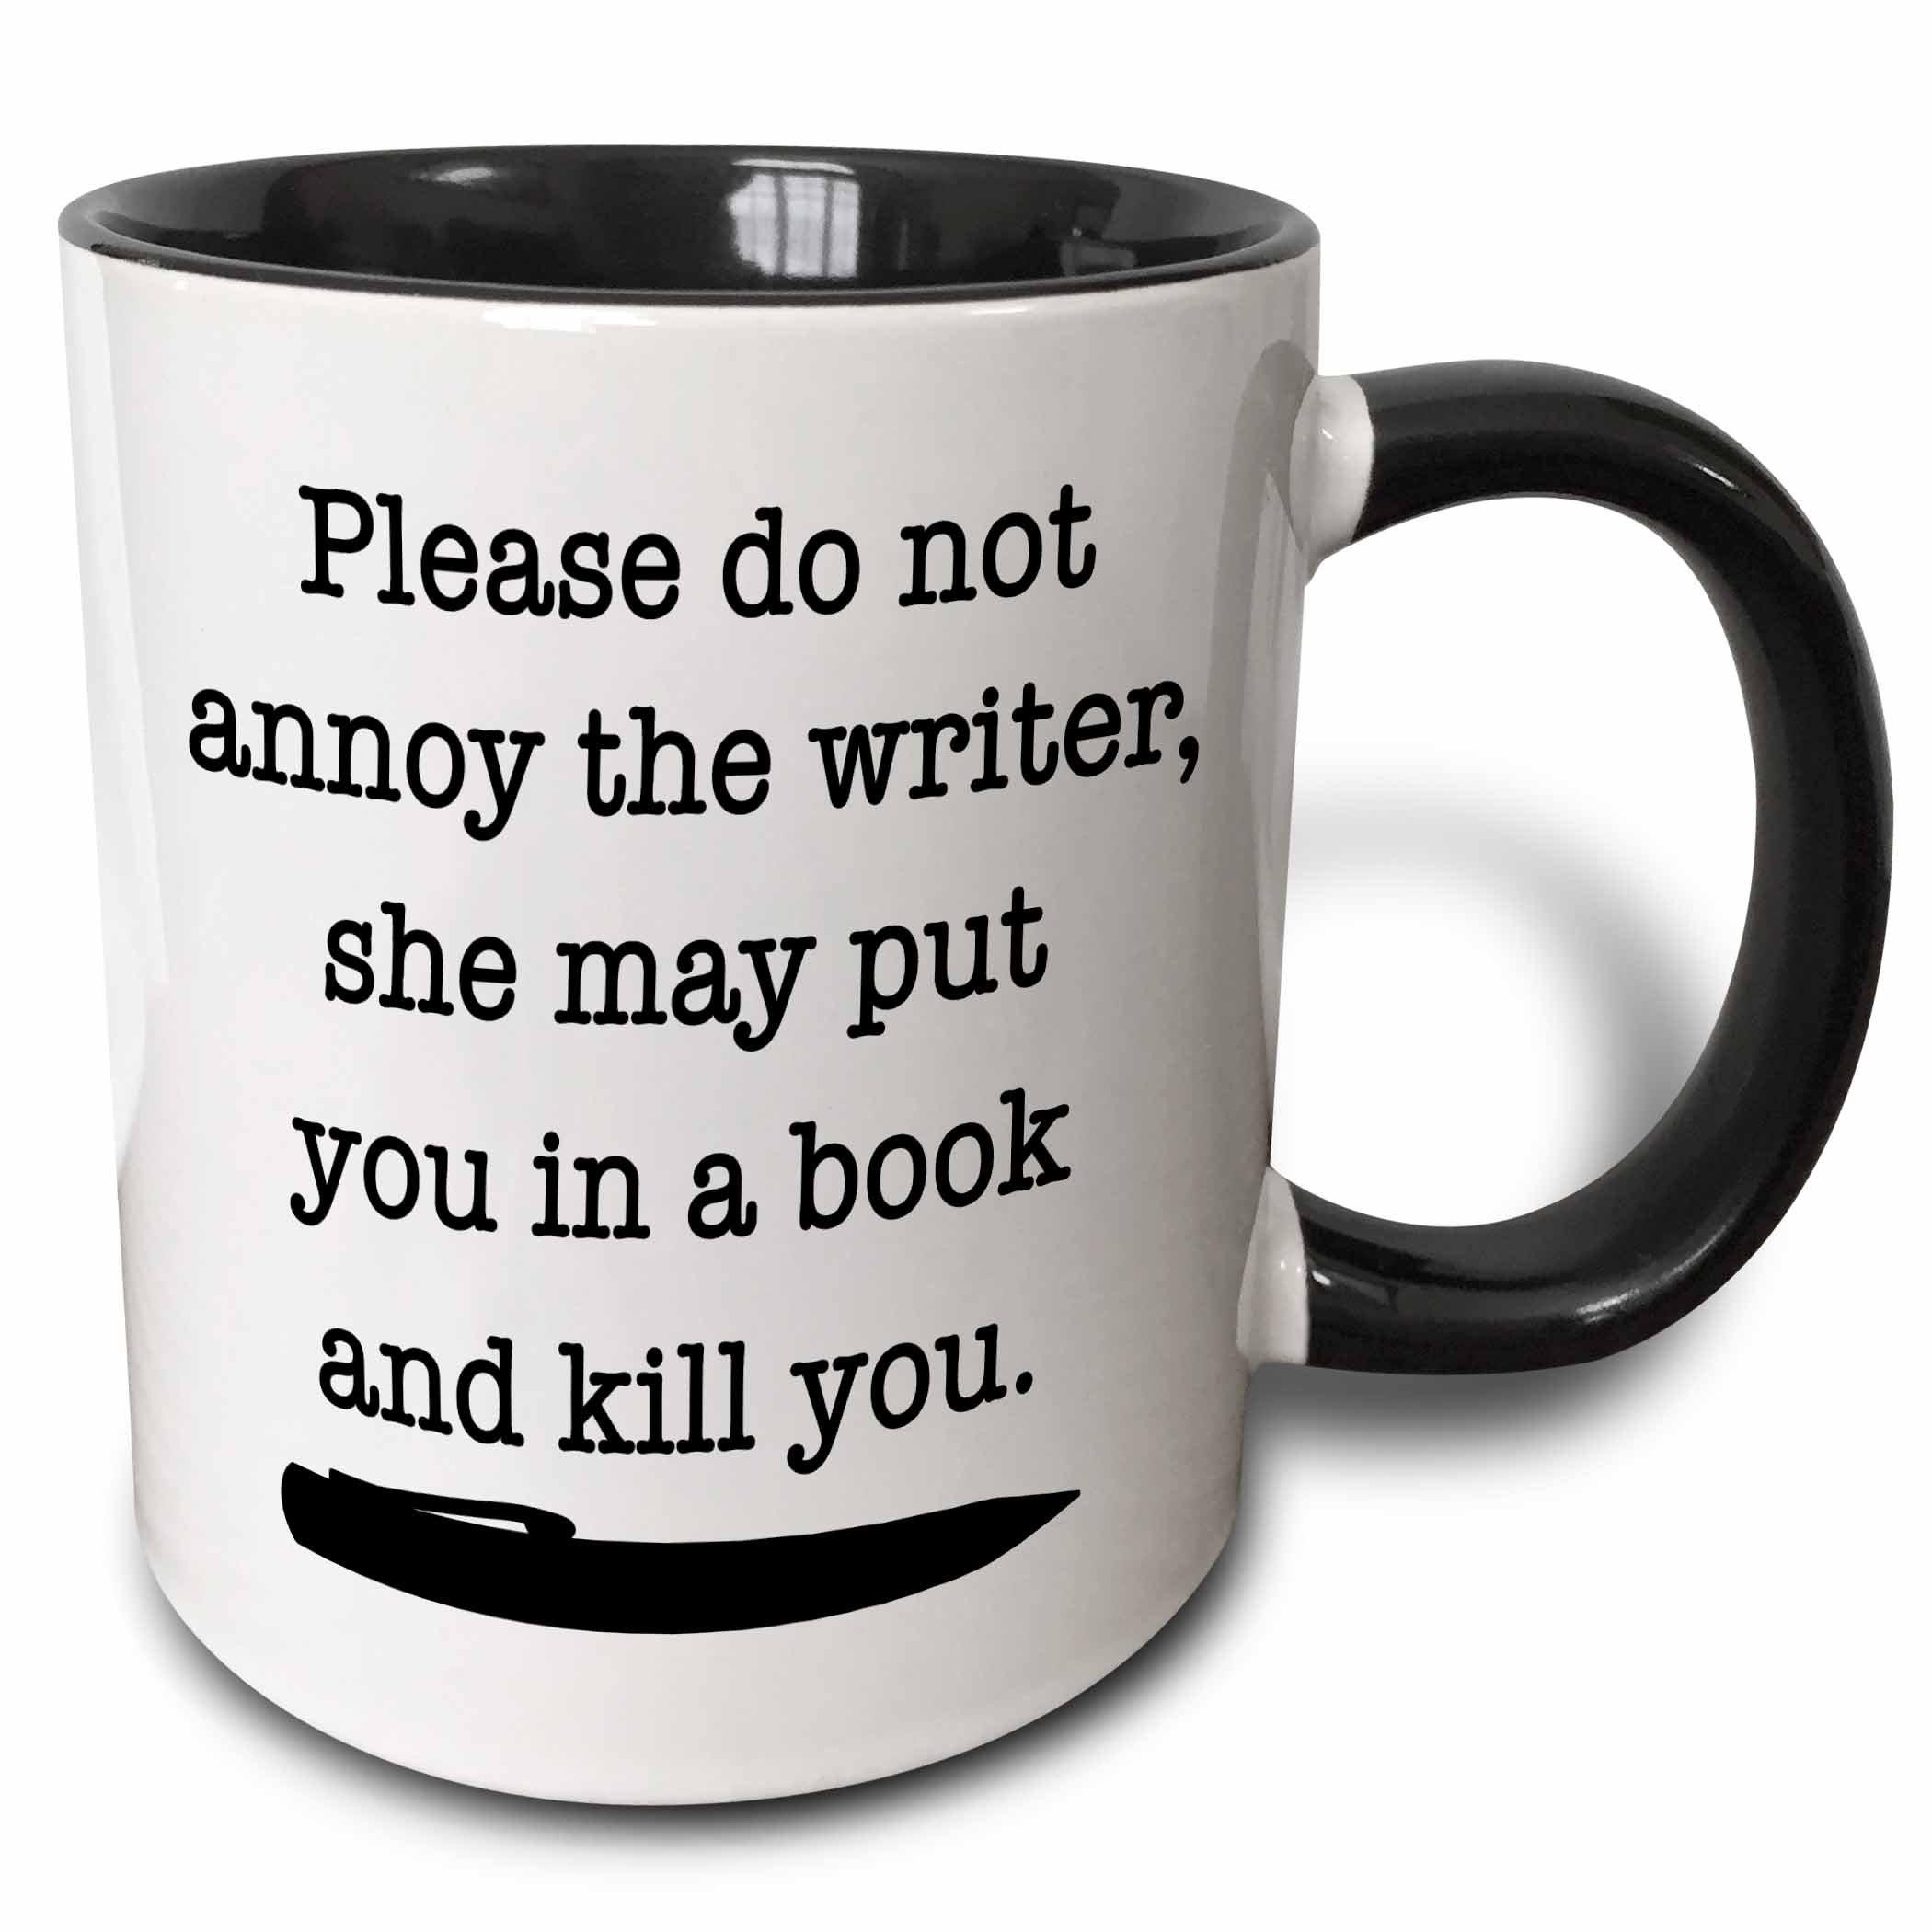 "3dRose ""Please Do Not Annoy The Writer Black"" Mug, 11 oz, Black"